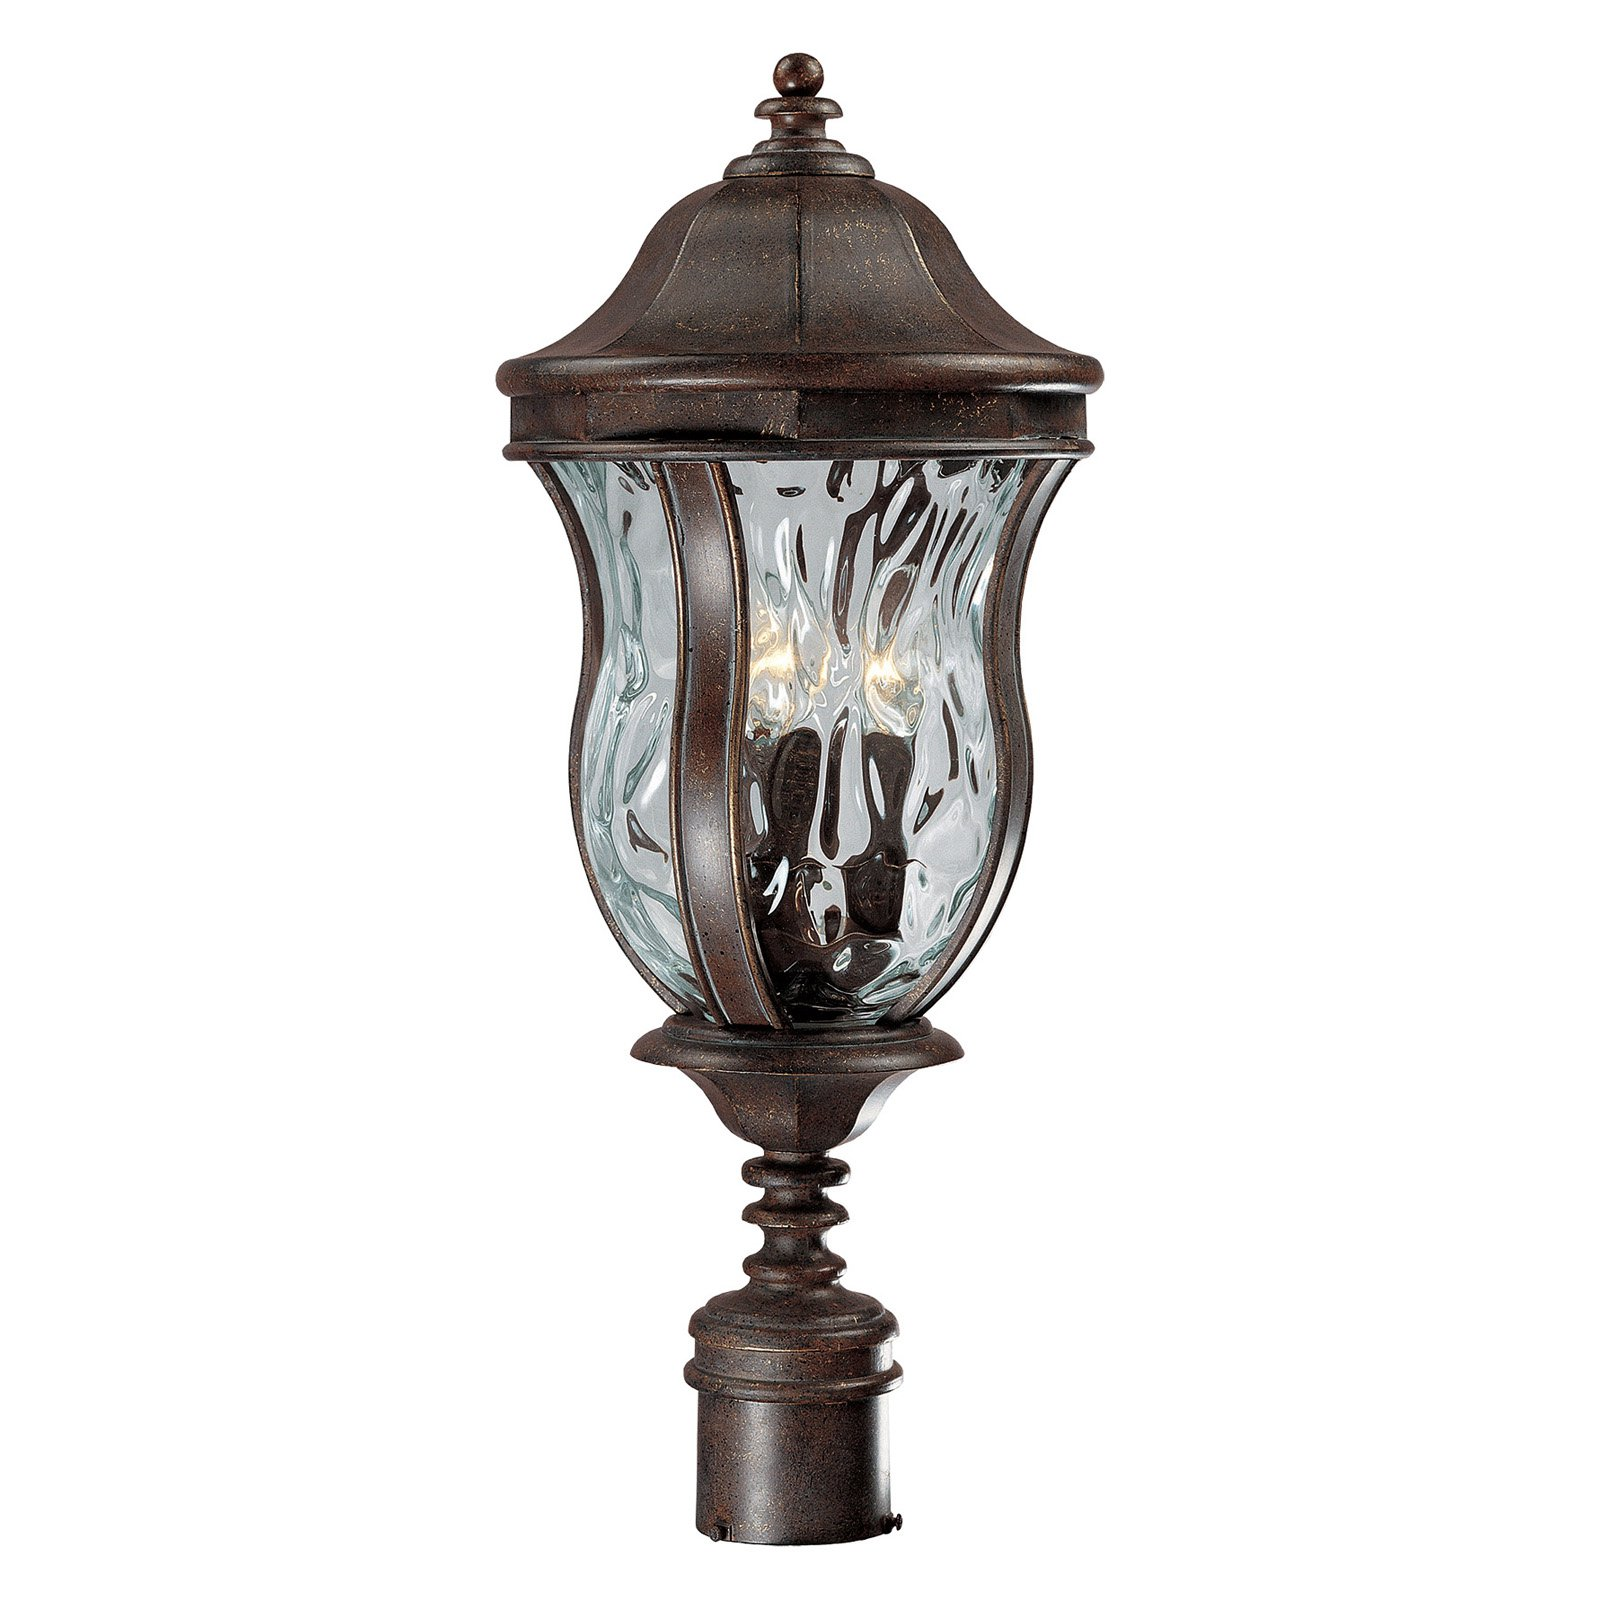 Savoy House Monticello KP-5-301 Outdoor Post Lantern by Savoy House